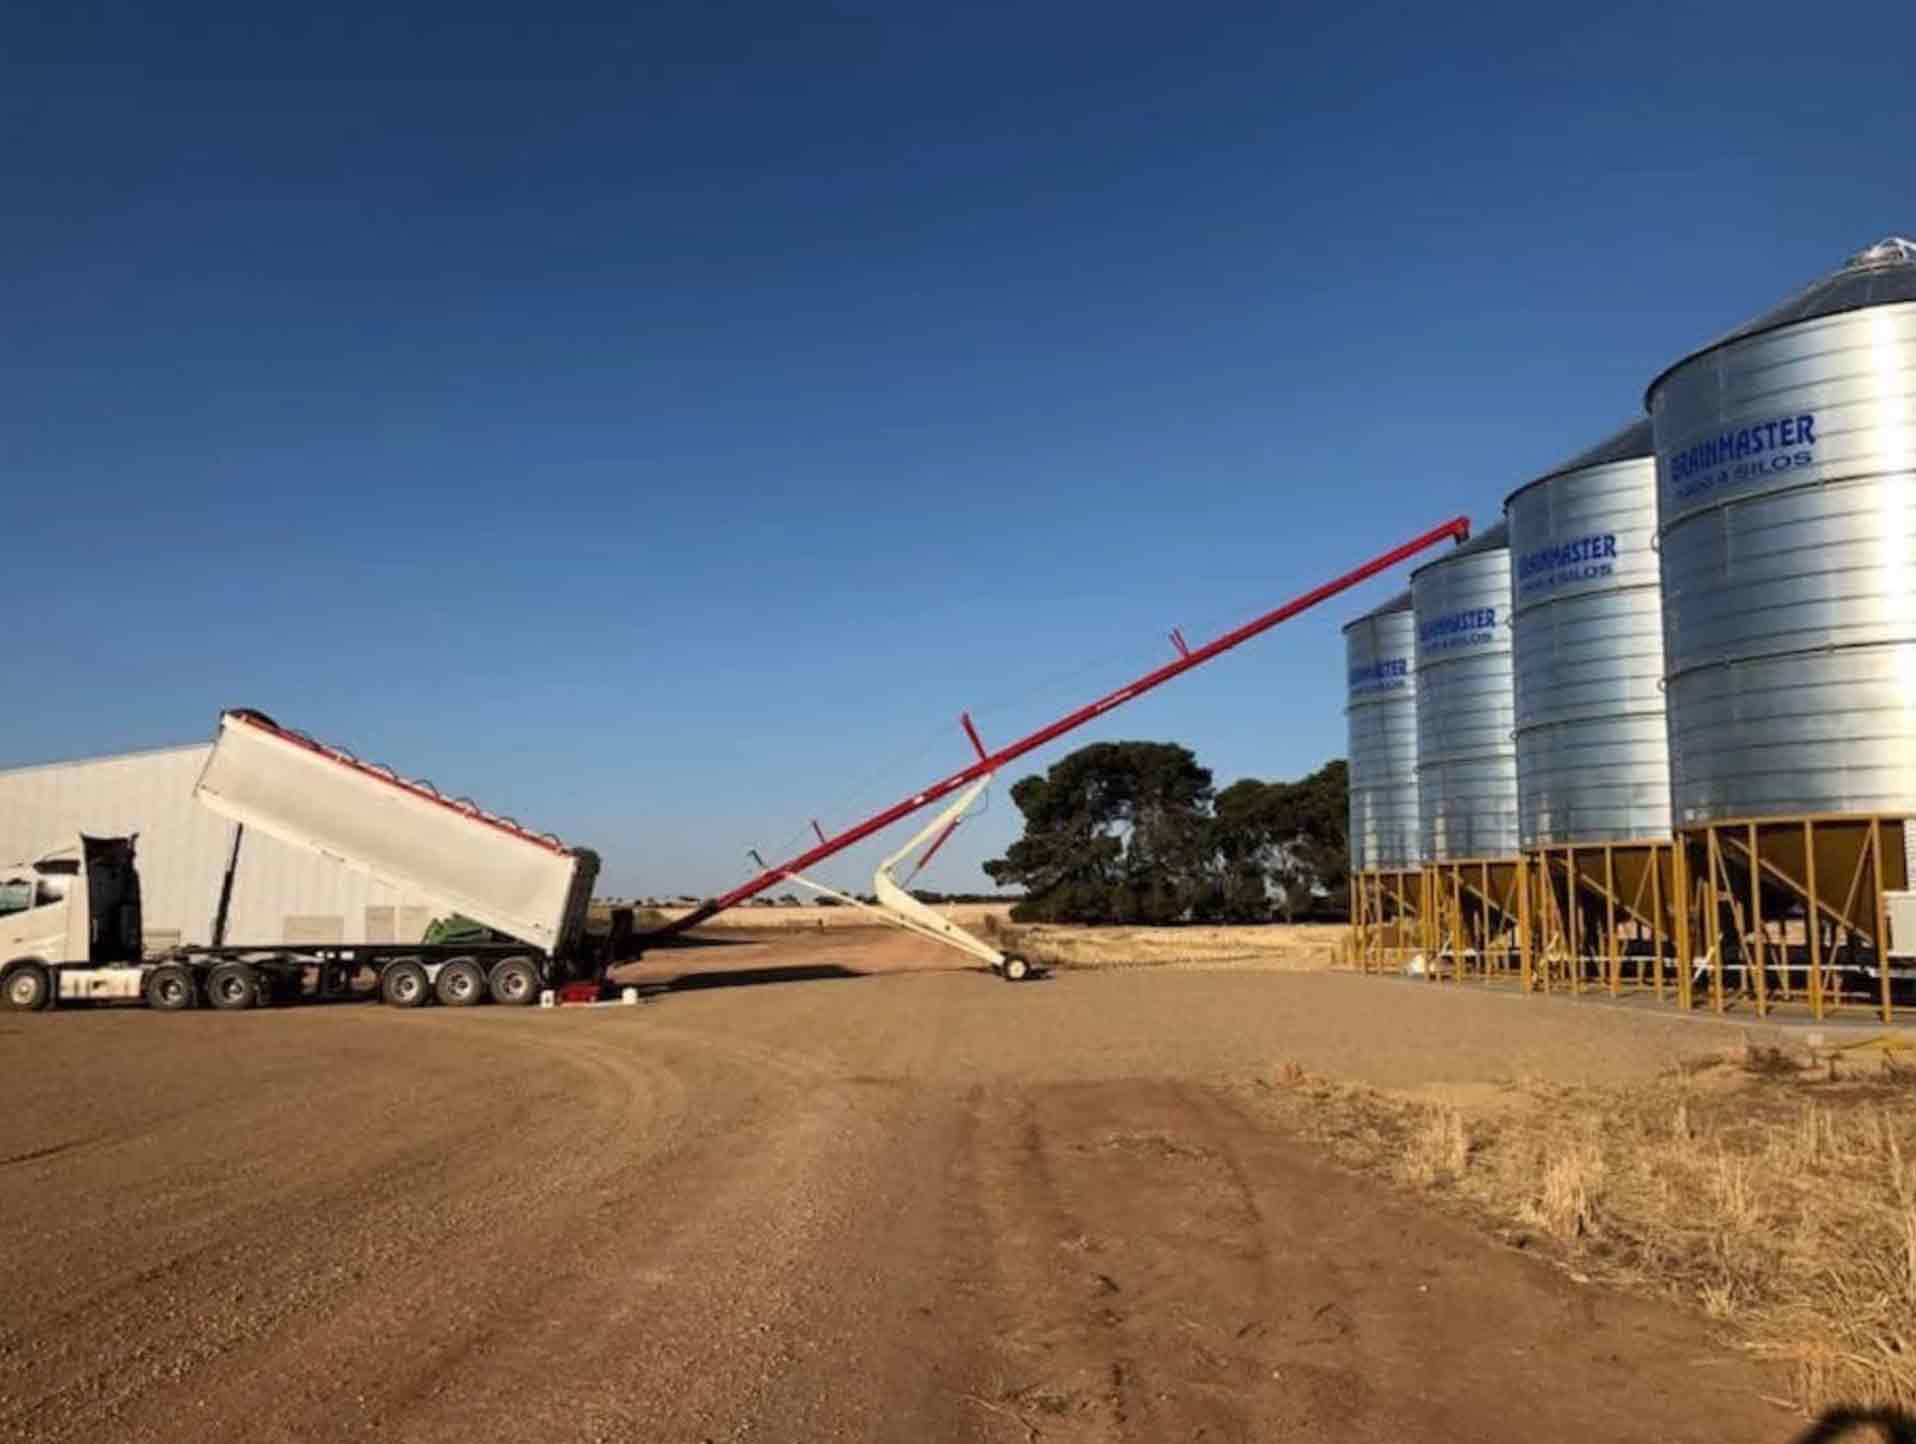 4 x GrainMaster Silos on farm in Maitland - 210T each.